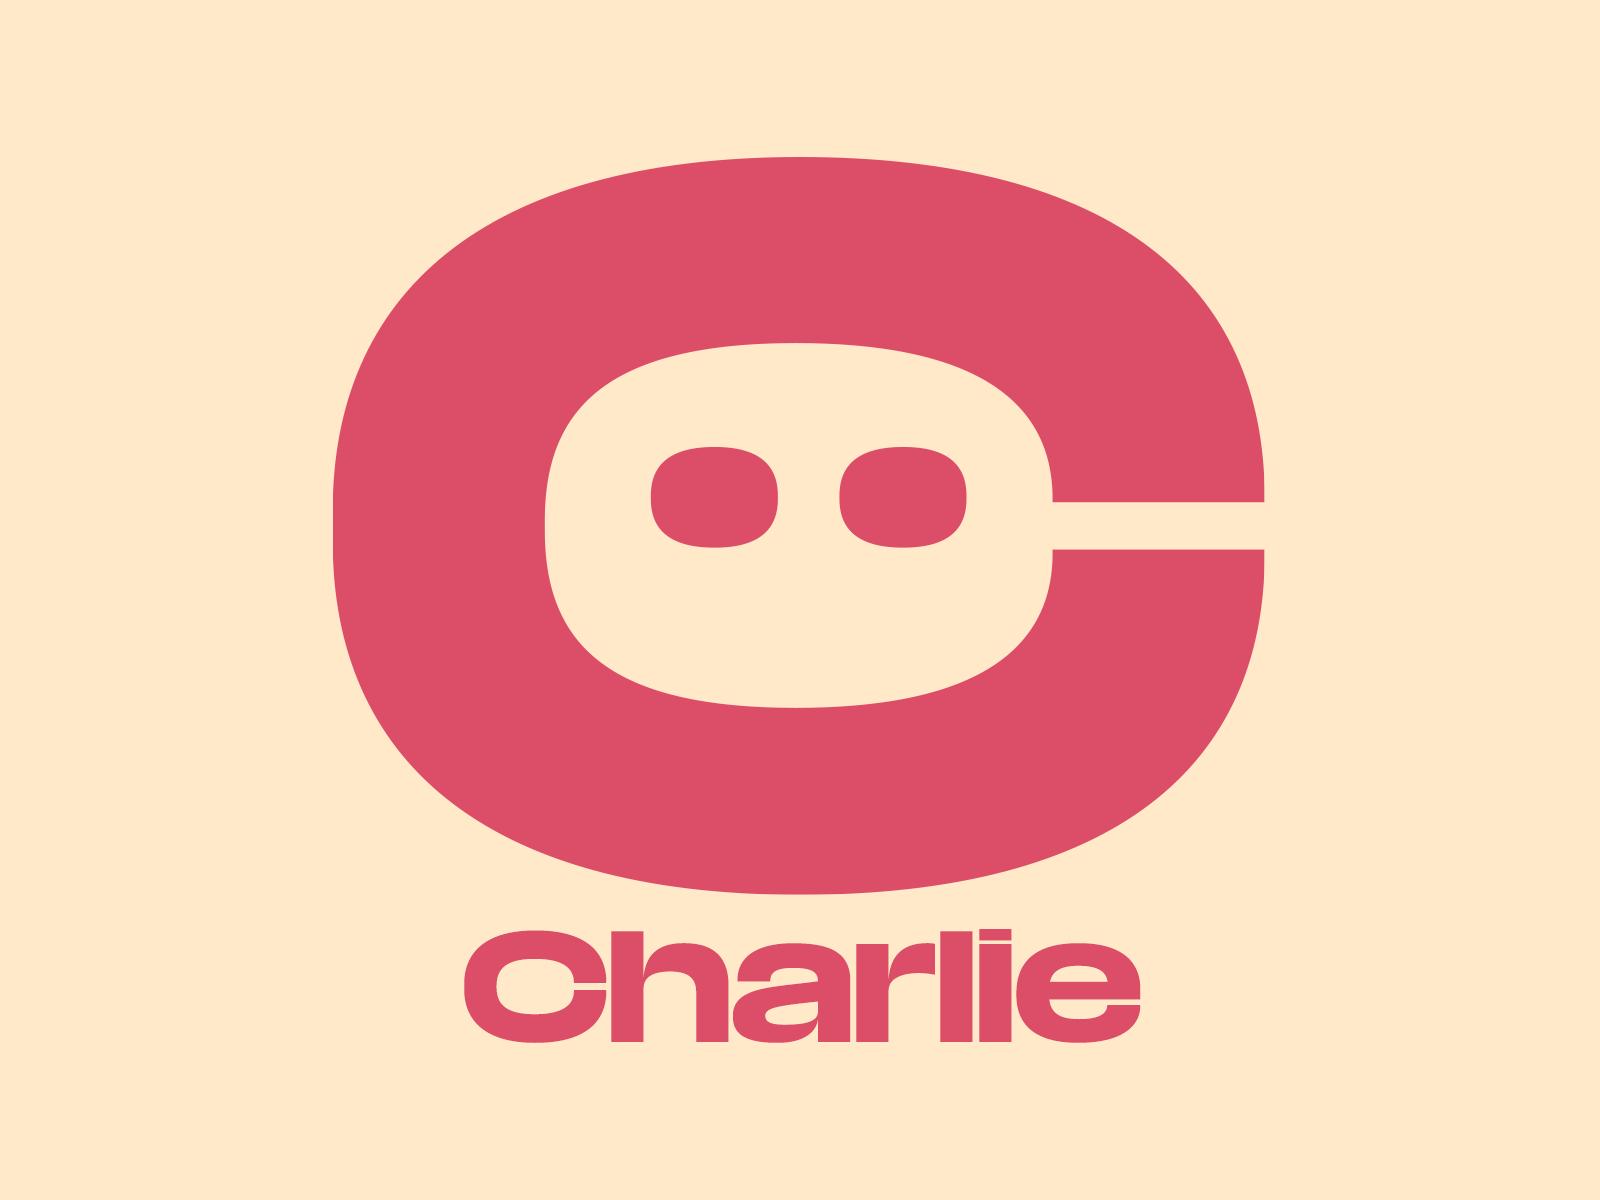 Charlie Walton - Charlie Walton's Blog